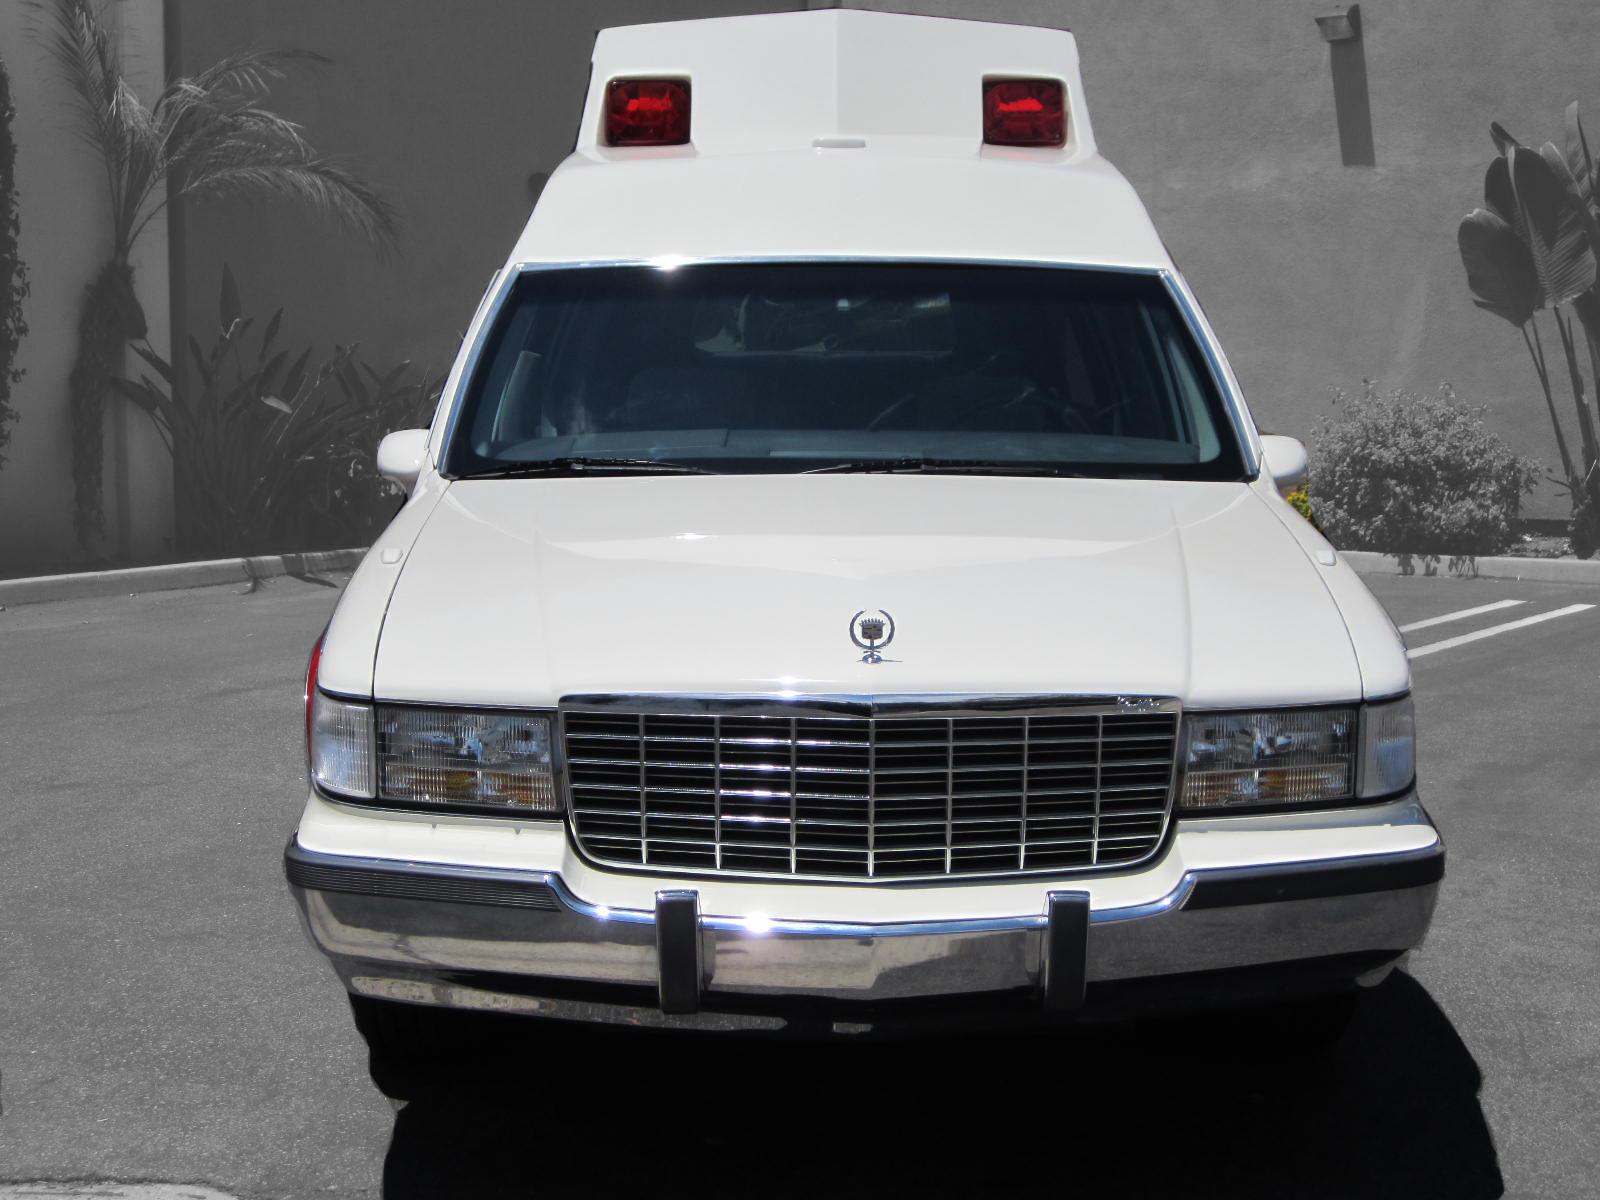 1993 Cadiilac Fleetwood Ambulance For Sale 006